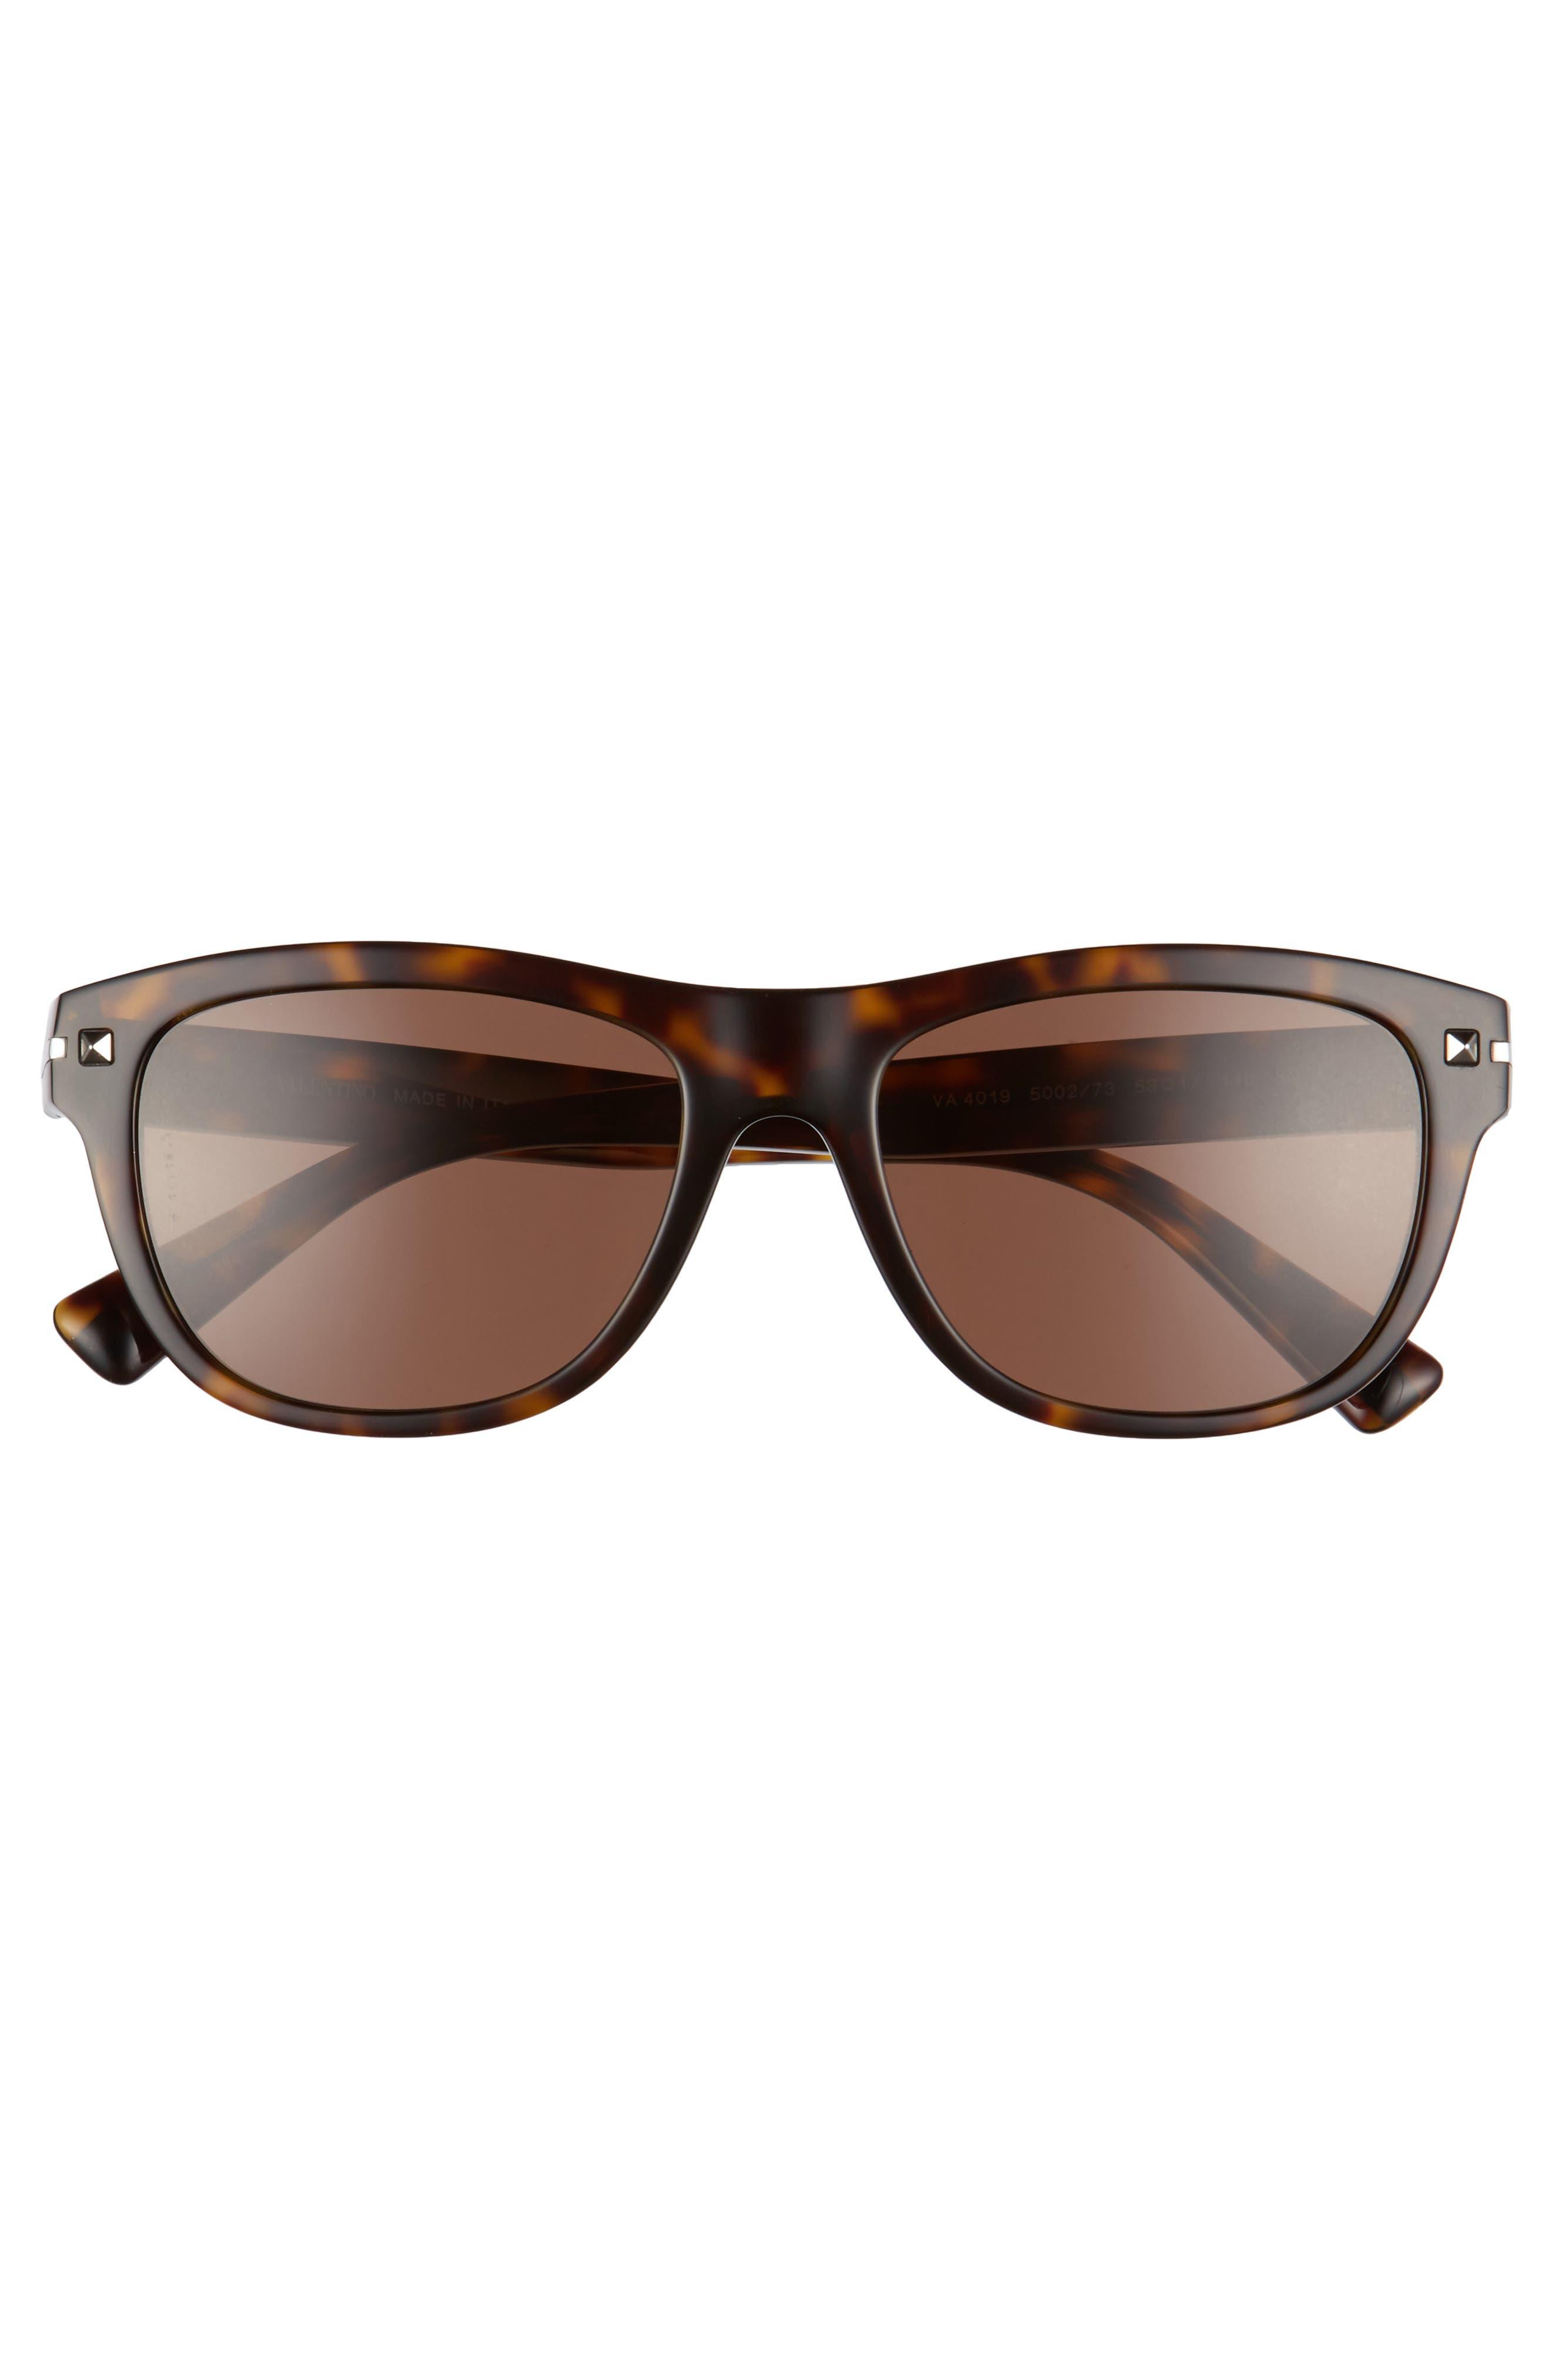 53mm Sunglasses,                             Alternate thumbnail 3, color,                             BROWN/ HAVANA